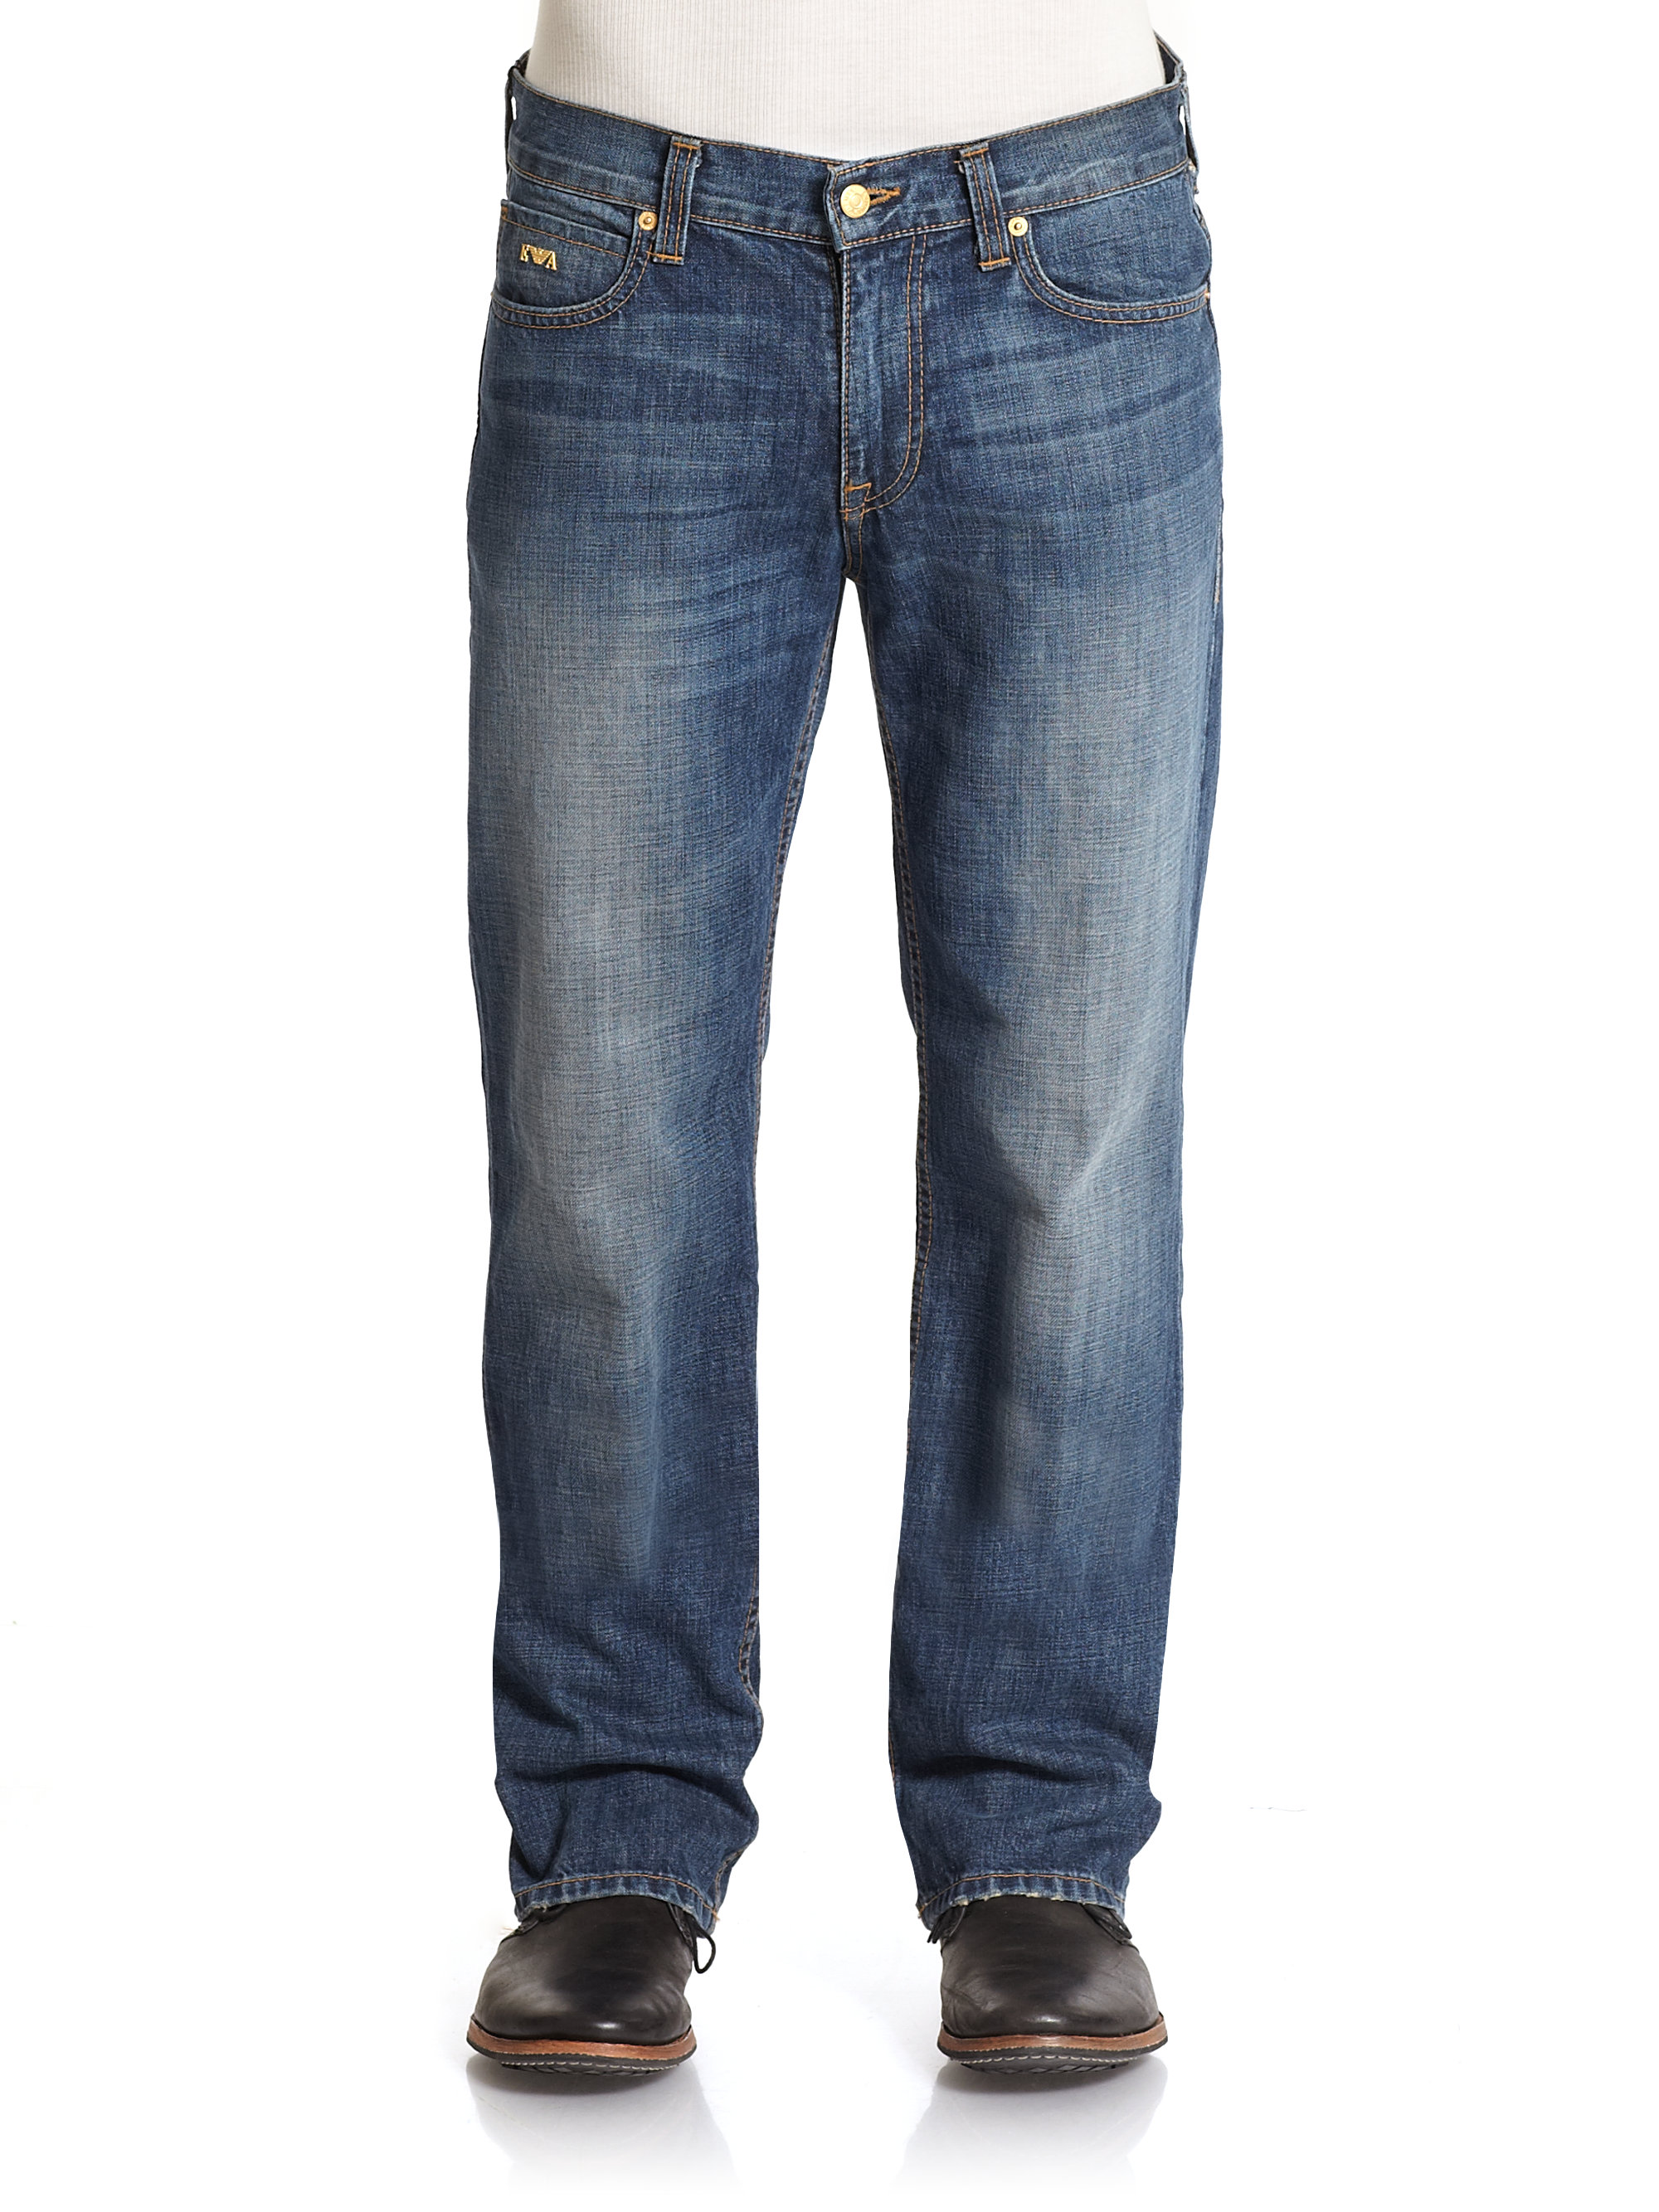 Lyst - Emporio armani Brad Darkwash Straightleg Jeans in Blue for Men